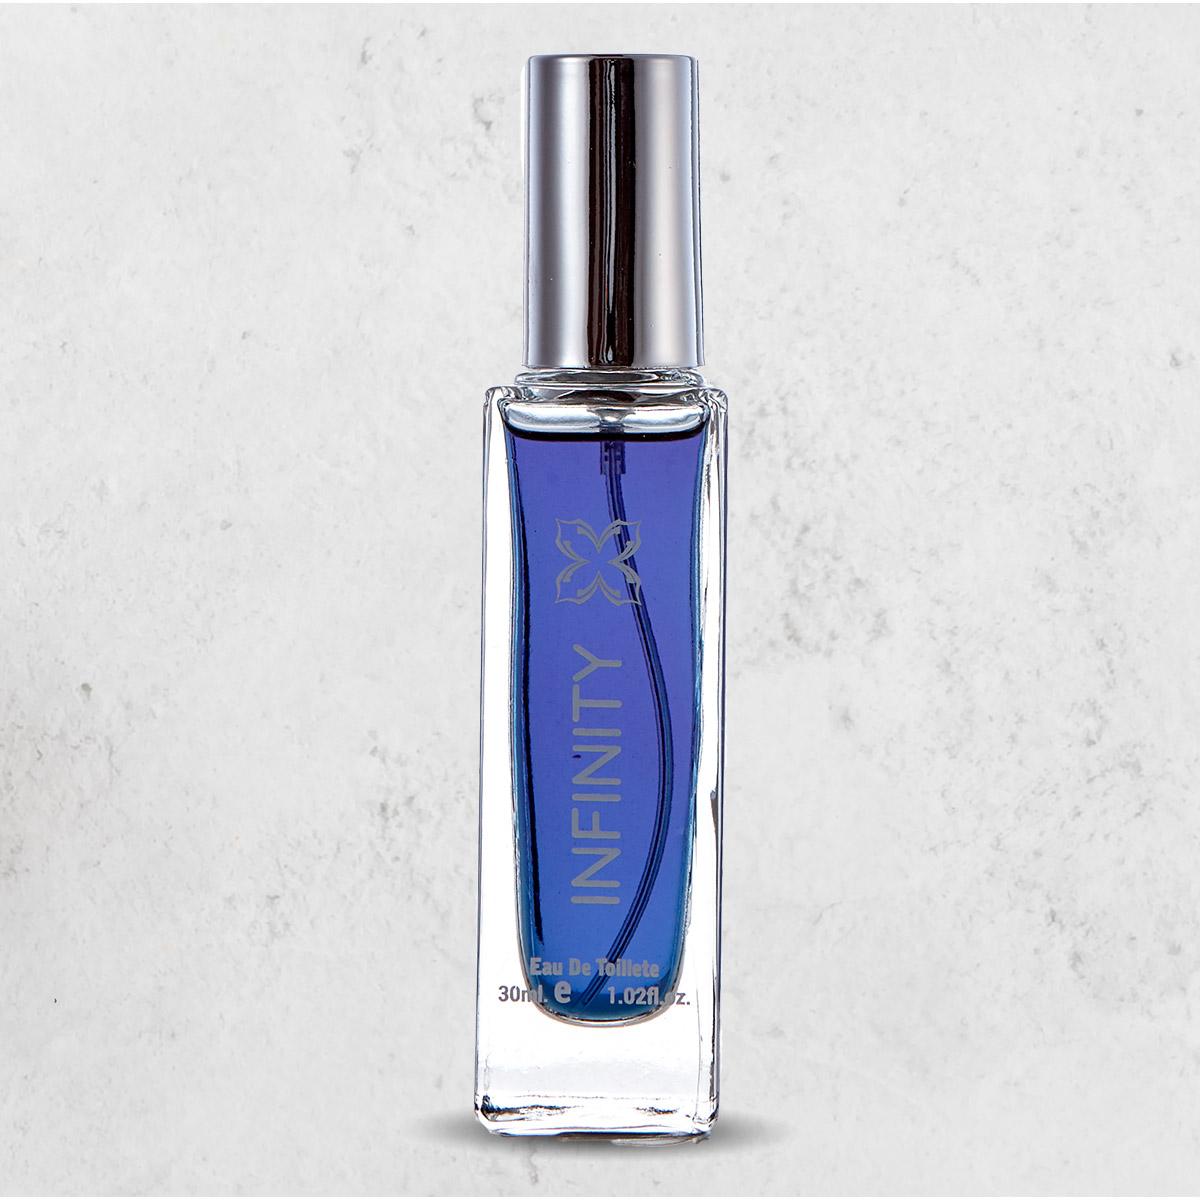 Essenciart Infinity Perfume Masculino Importado Edt 30ml